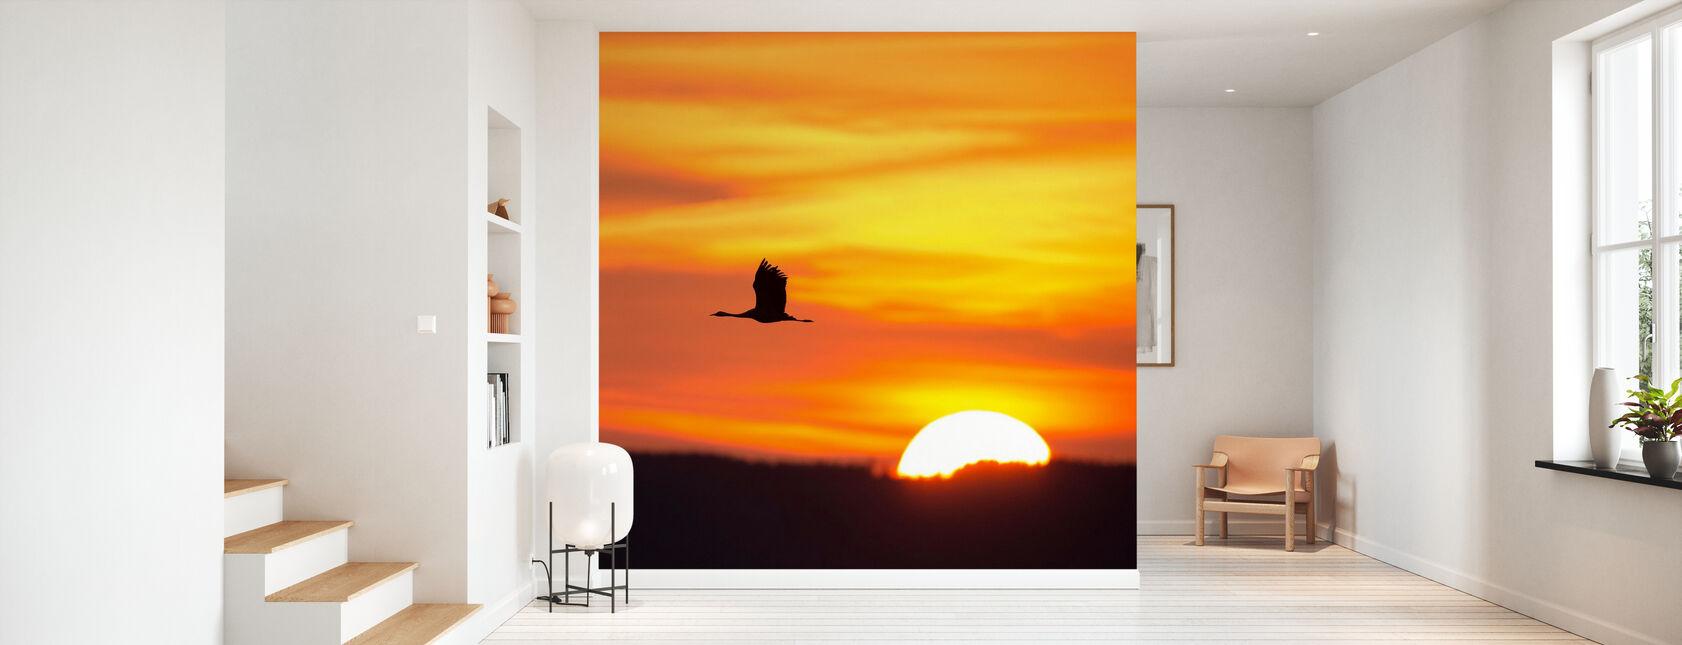 Crane and a Beautiful Sunrise - Wallpaper - Hallway